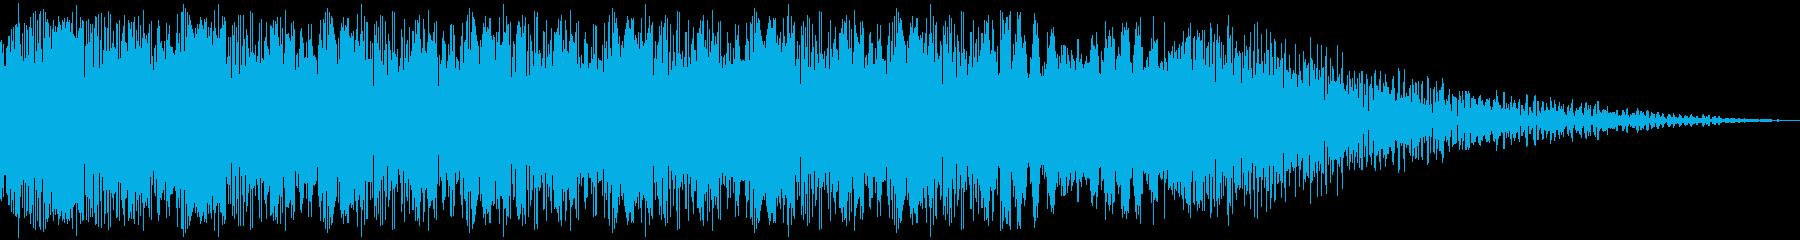 SF銃_14 BURSTの再生済みの波形